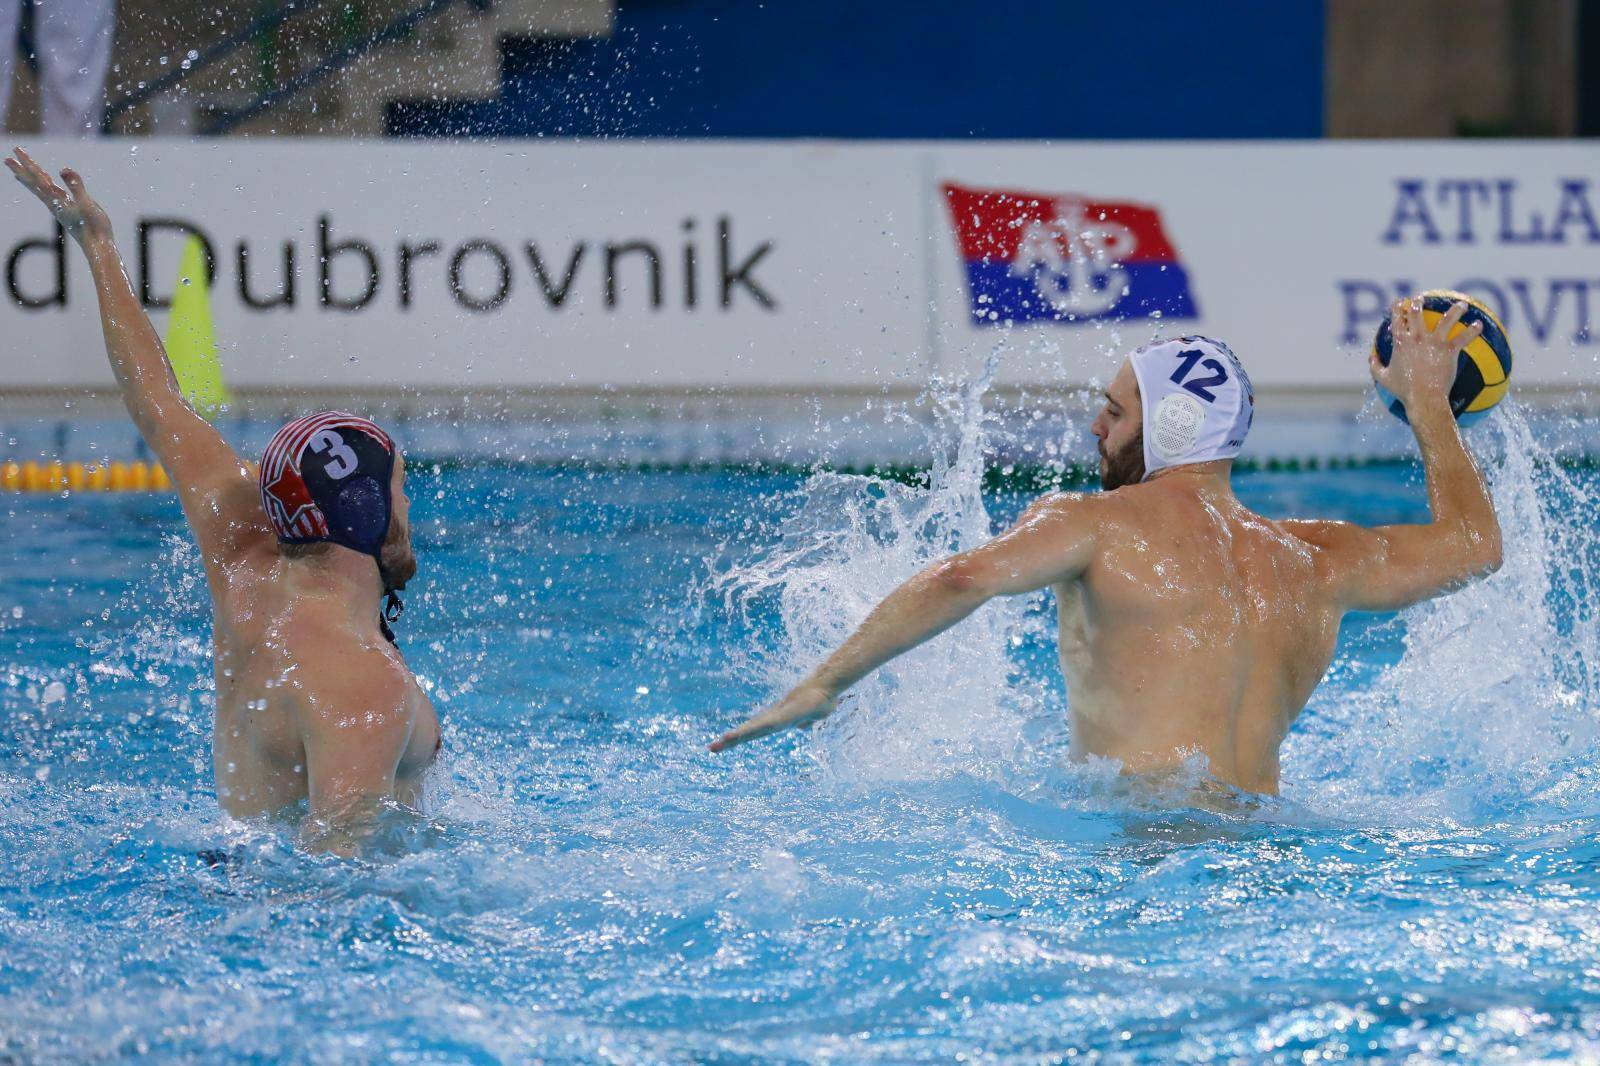 Dubrovnik: Regionalna vaterpolo liga, Jug Adriatic osiguranje - Crvena Zvezda